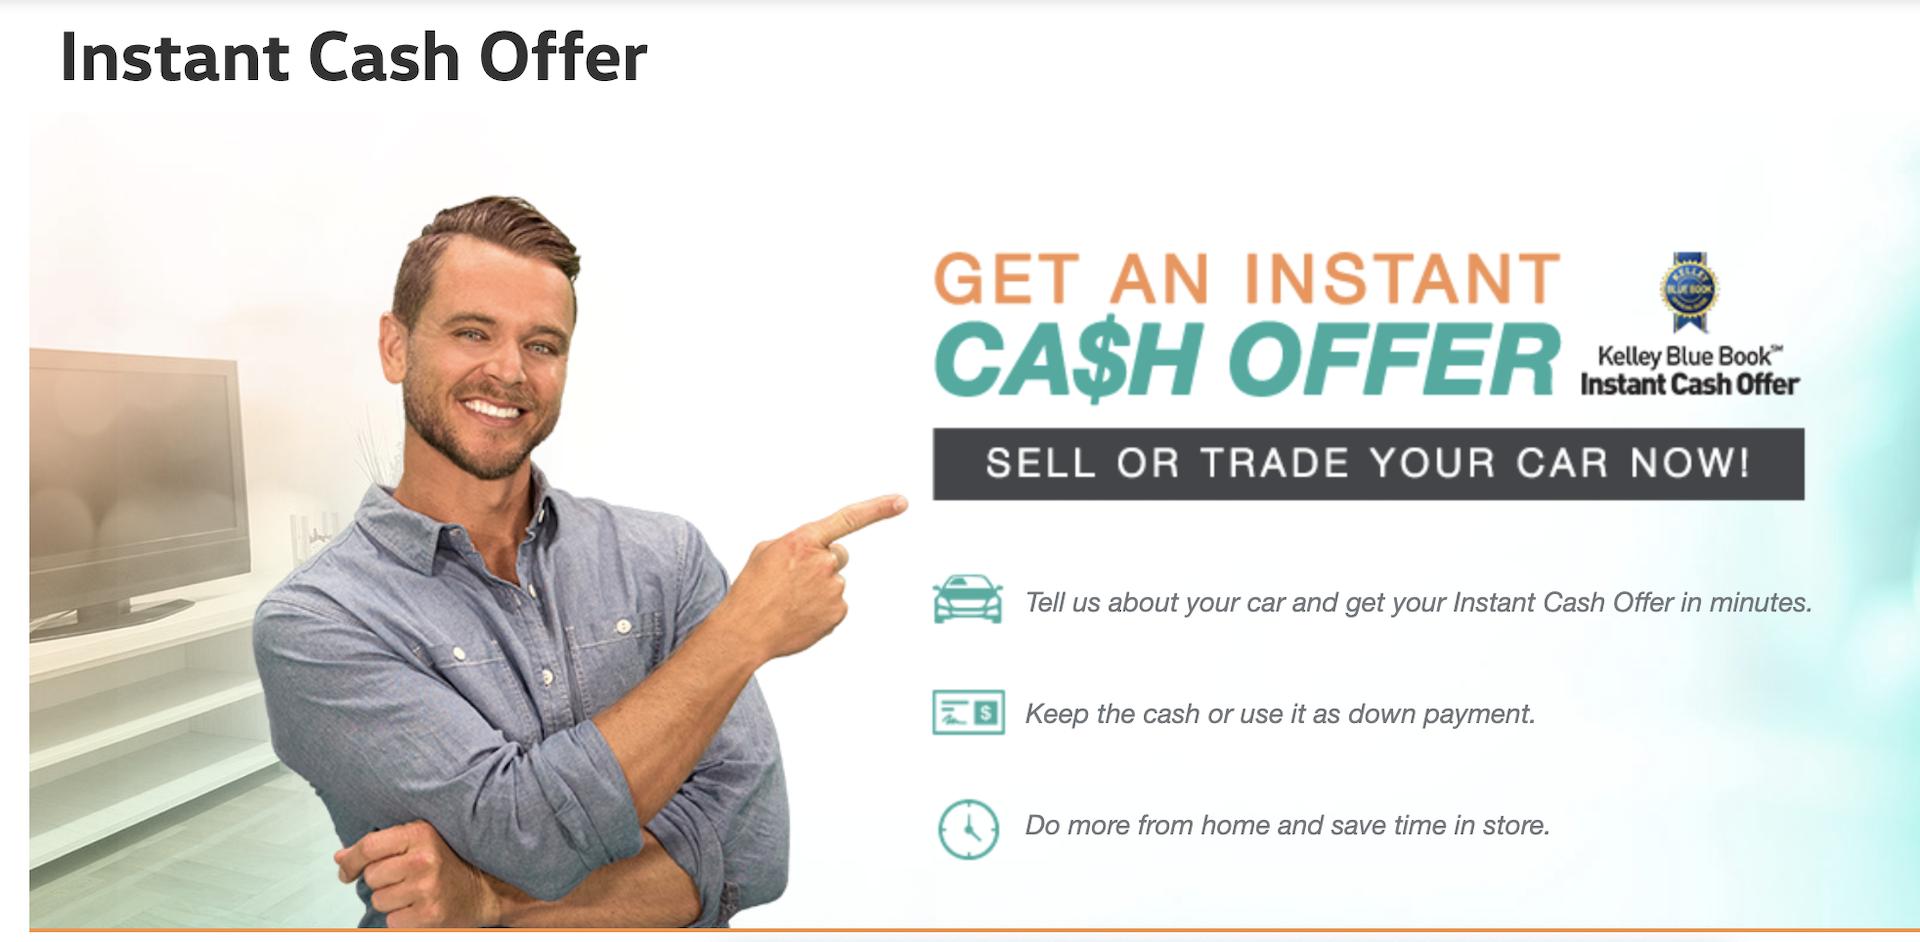 Get an Instant Cash Offer